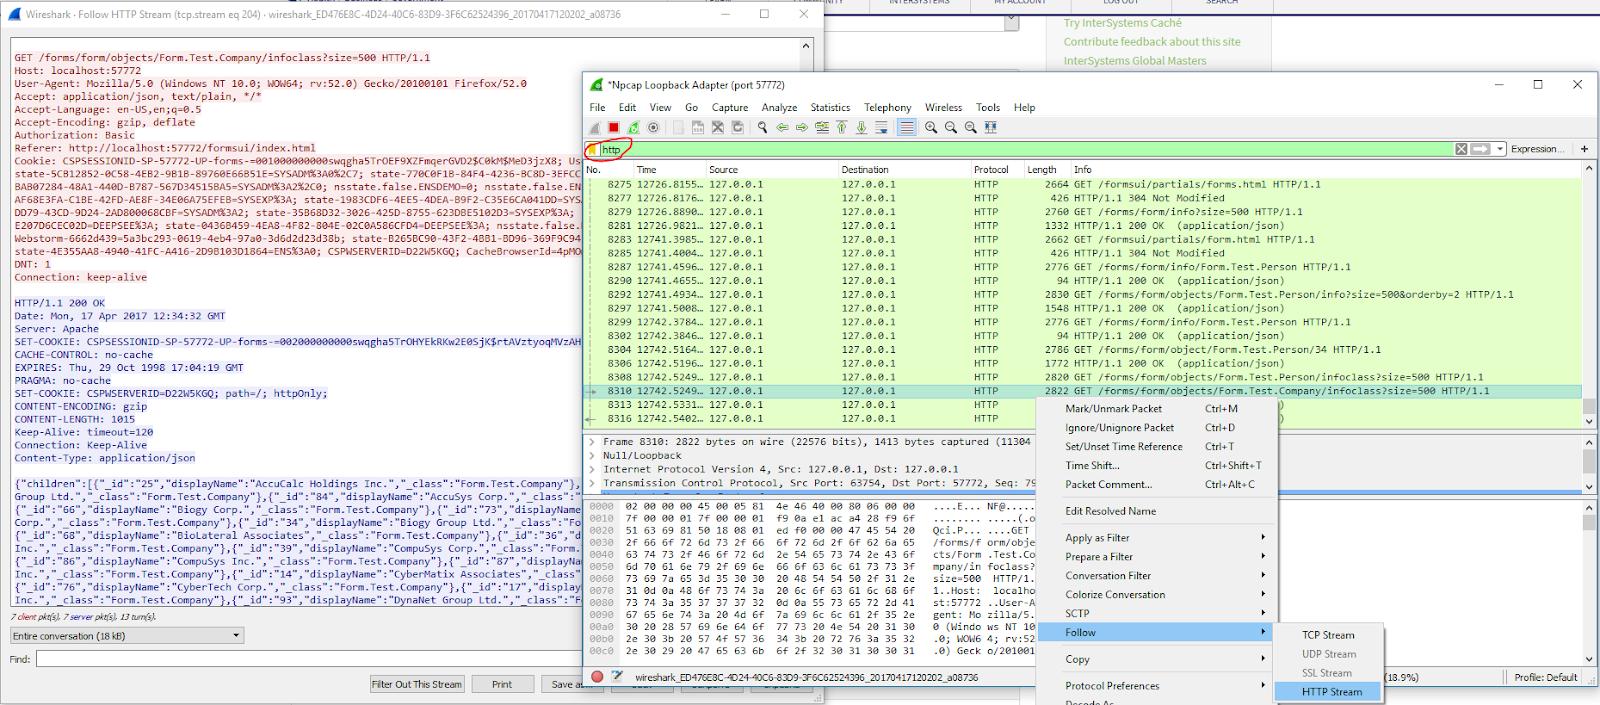 https://community.intersystems.com/sites/default/files/inline/images/snimok_25.png